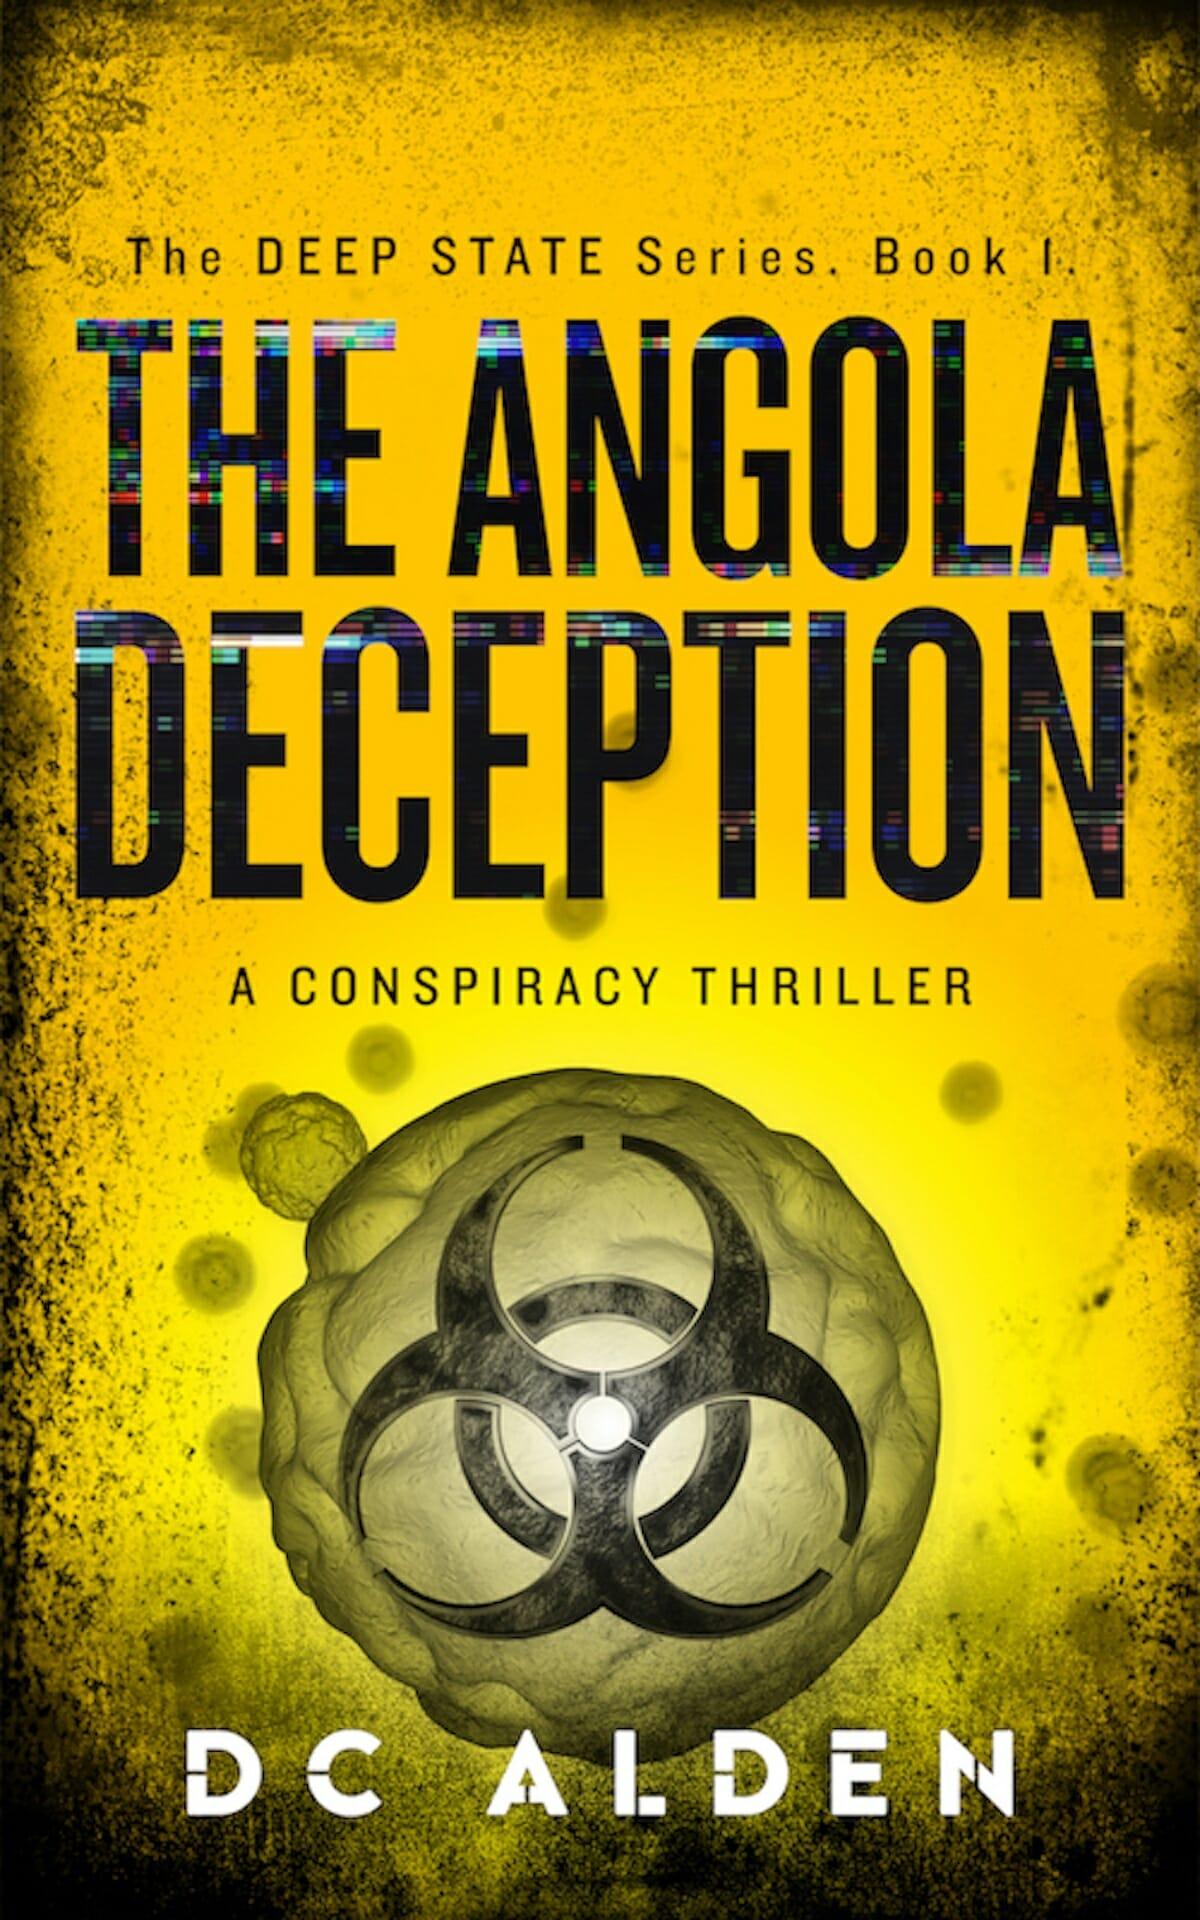 ANGOLA-COVER-1200.jpg